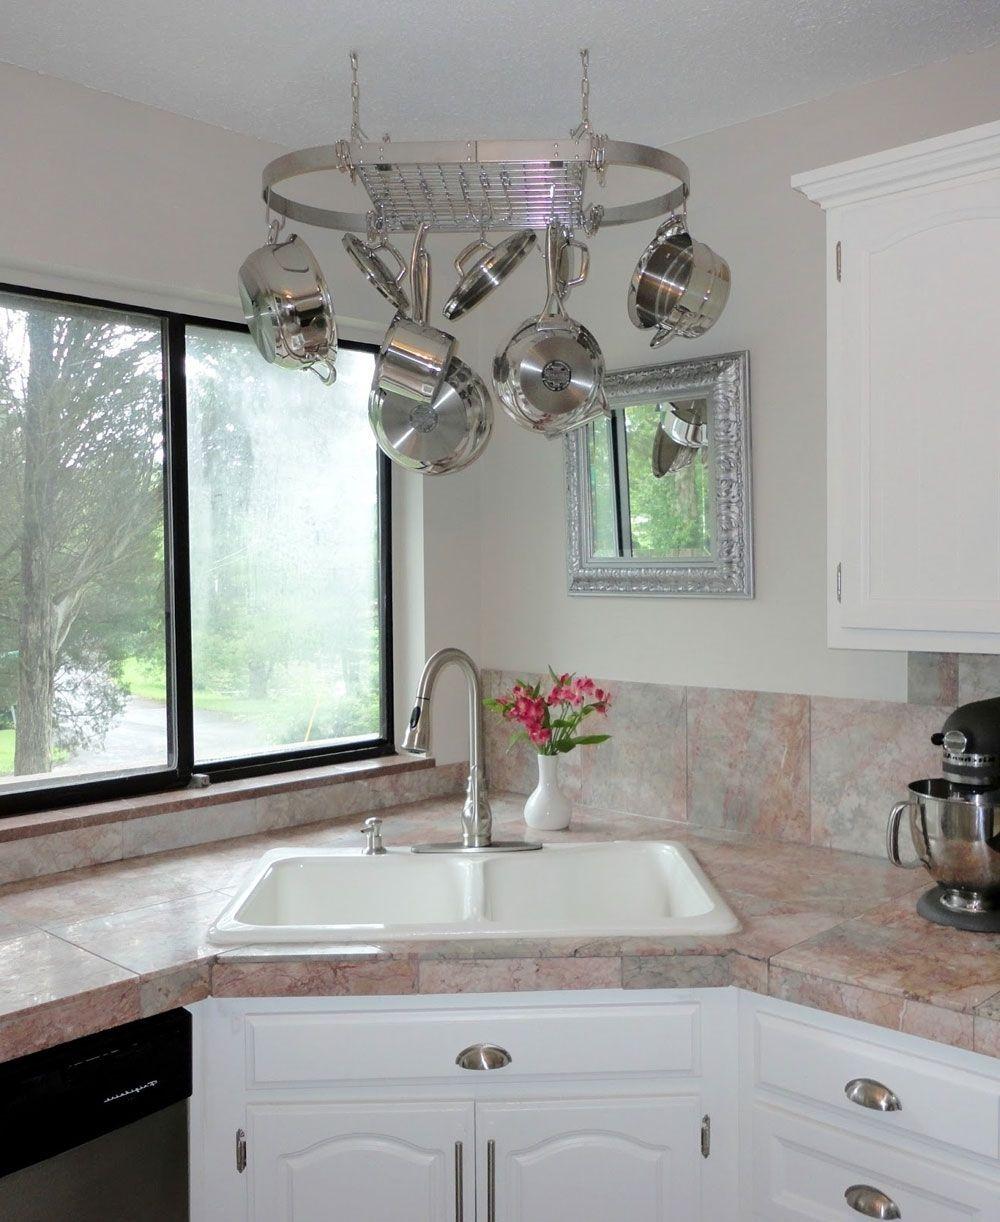 8 beautiful corner kitchen sink ideas remodel for your perfect home corner sink kitchen on kitchen sink ideas id=84807